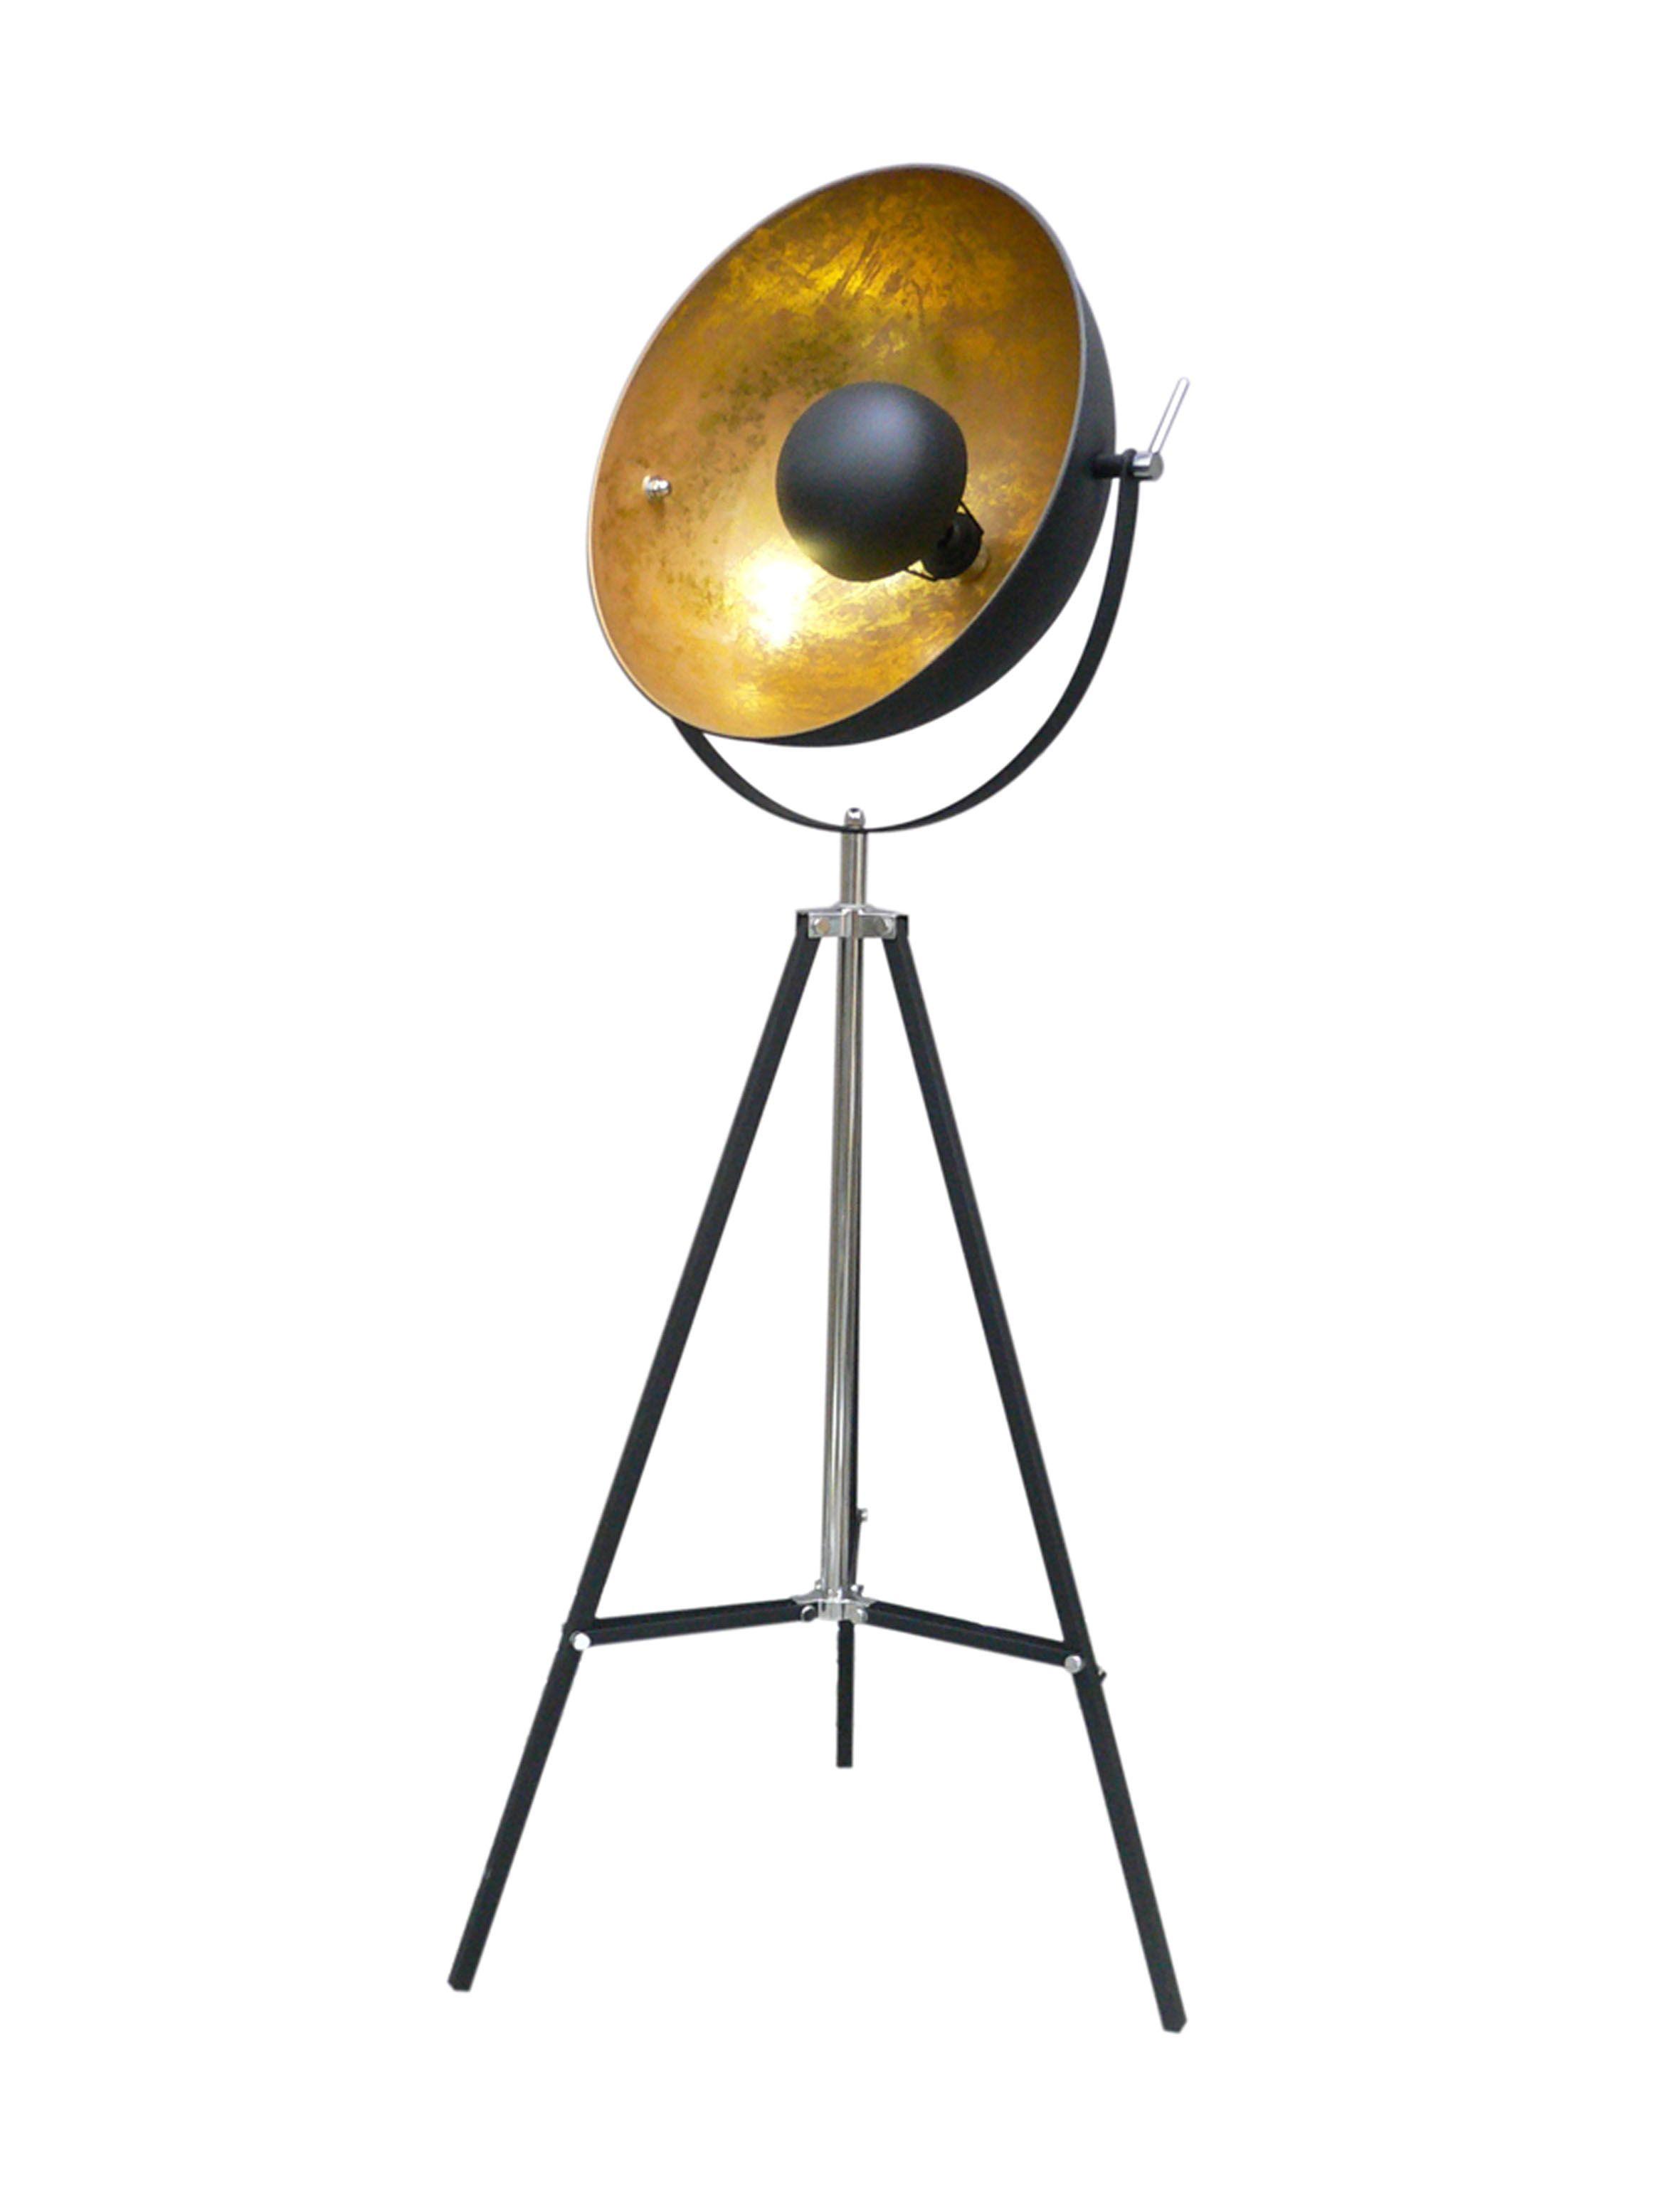 ts090522fbk antenne lampa pod�ogowa oświetlenie